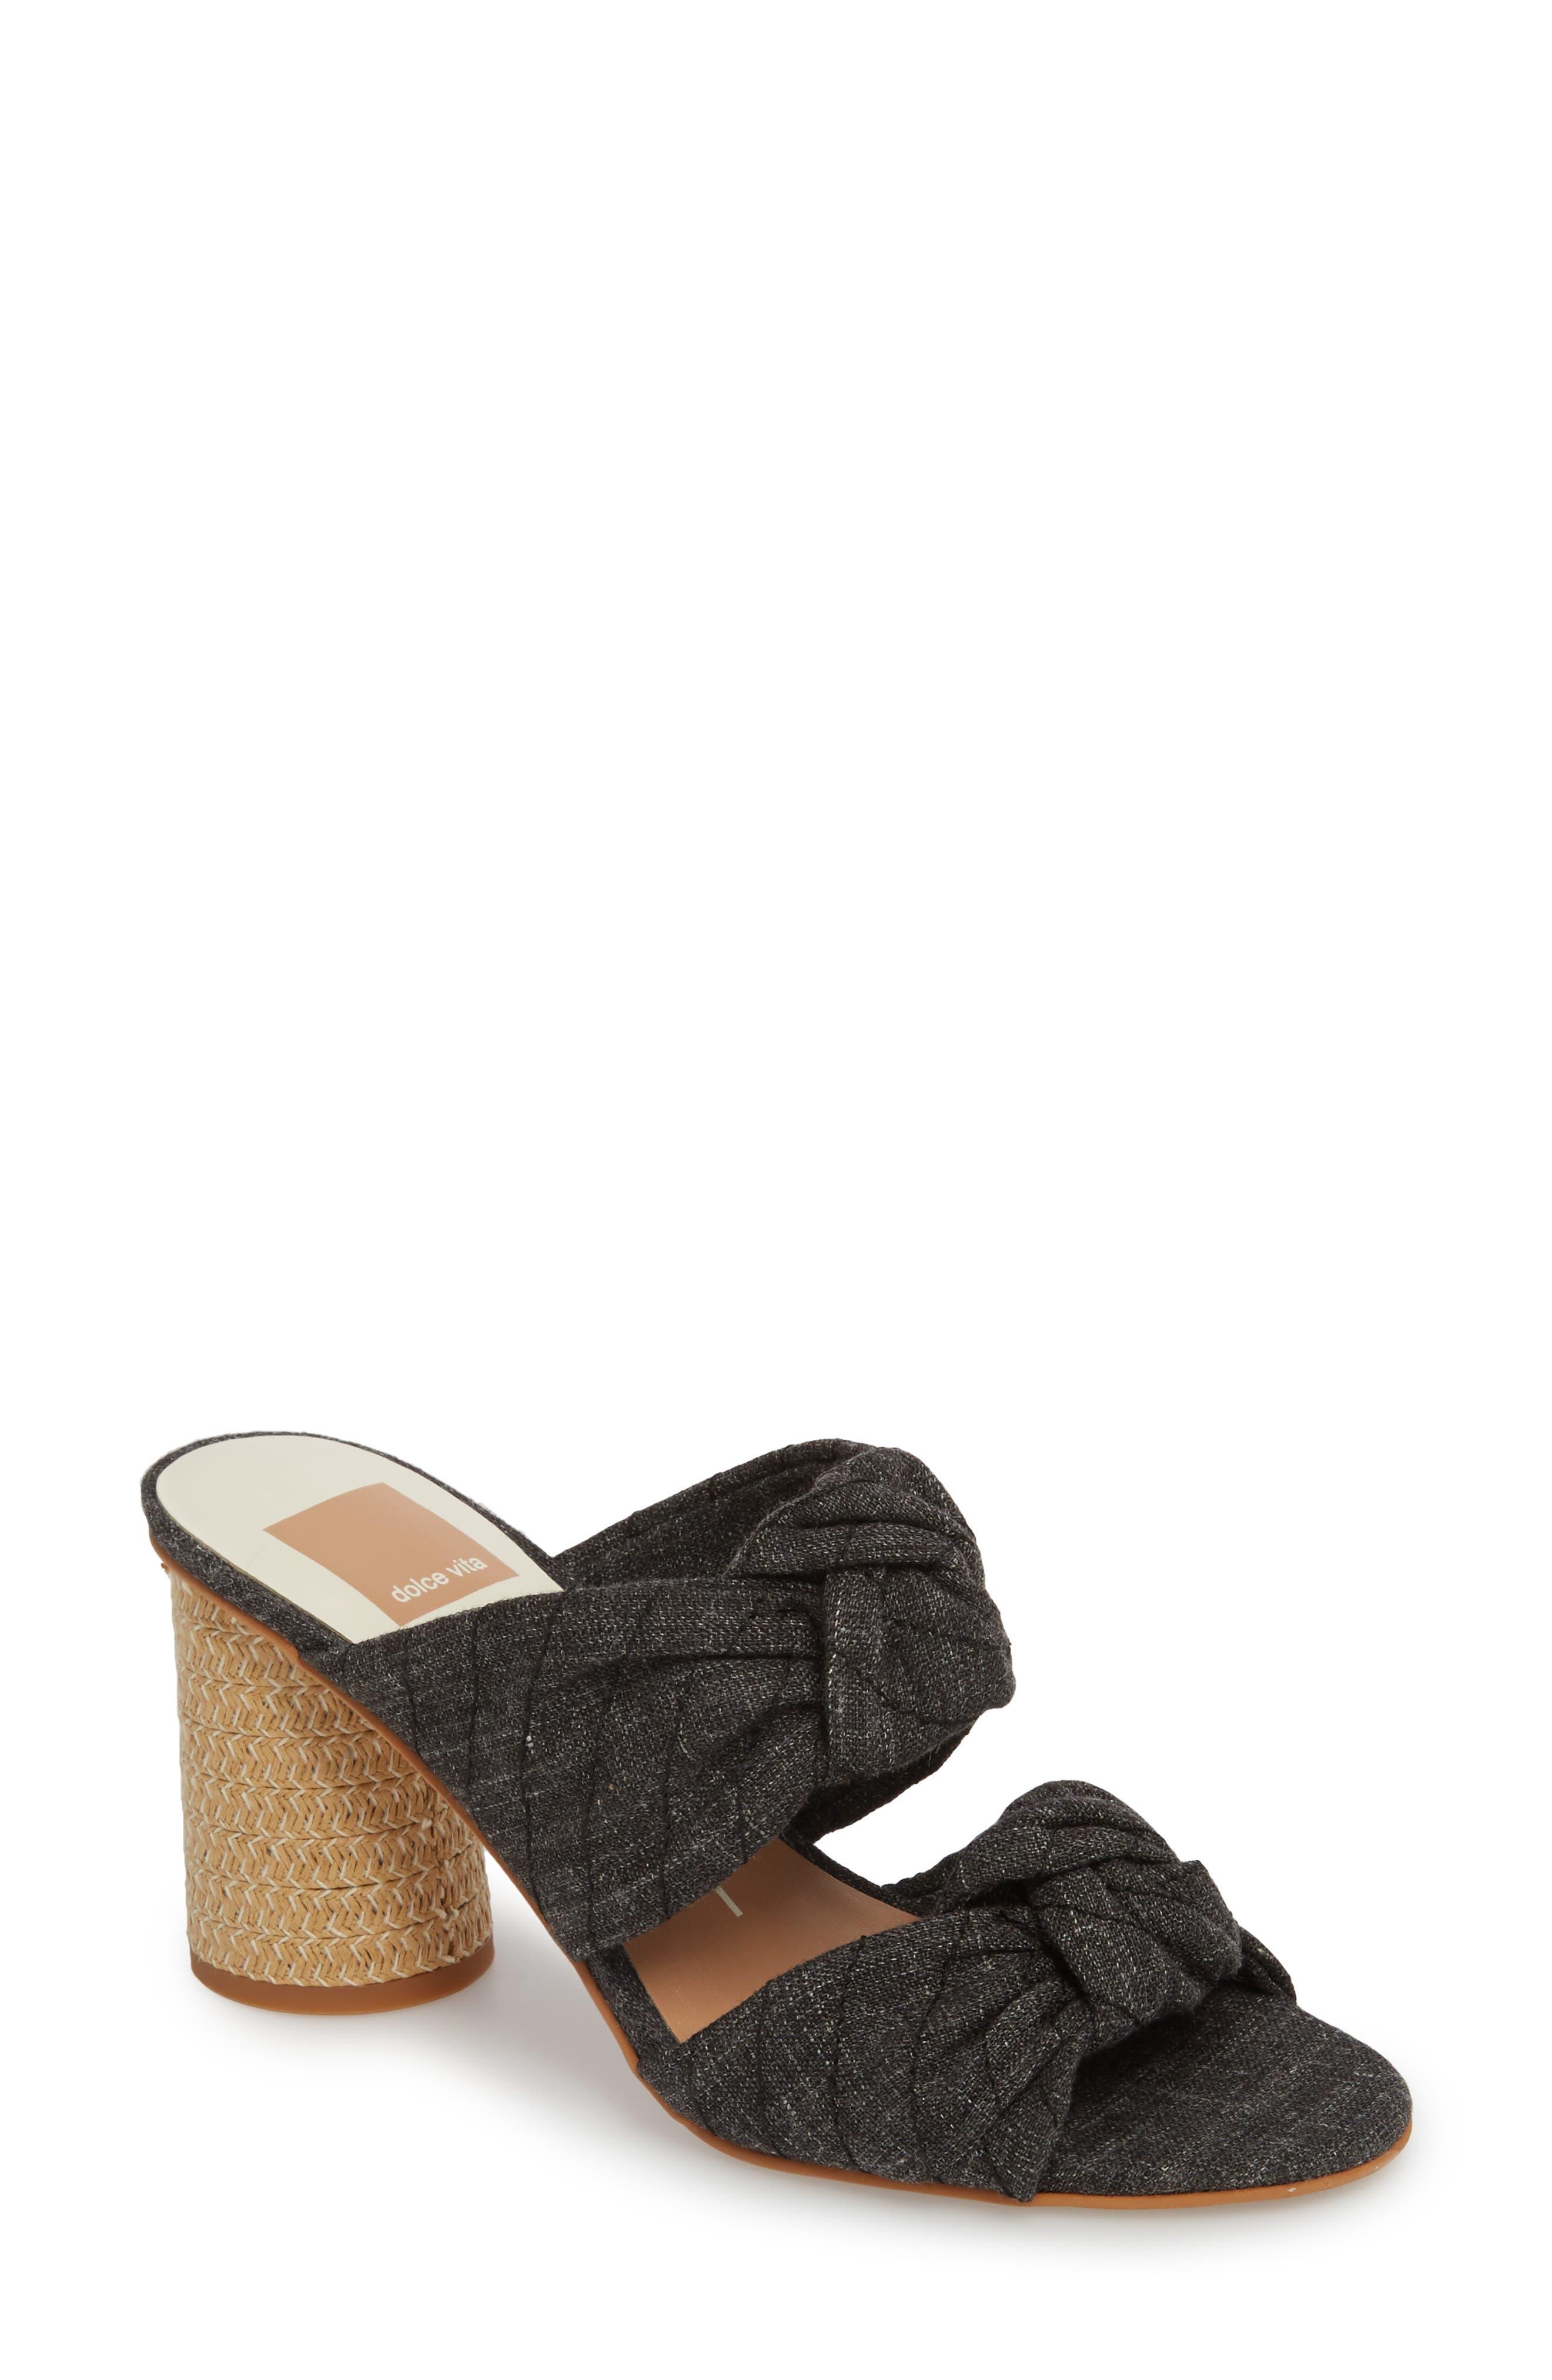 Jene Double Knot Sandal,                         Main,                         color,